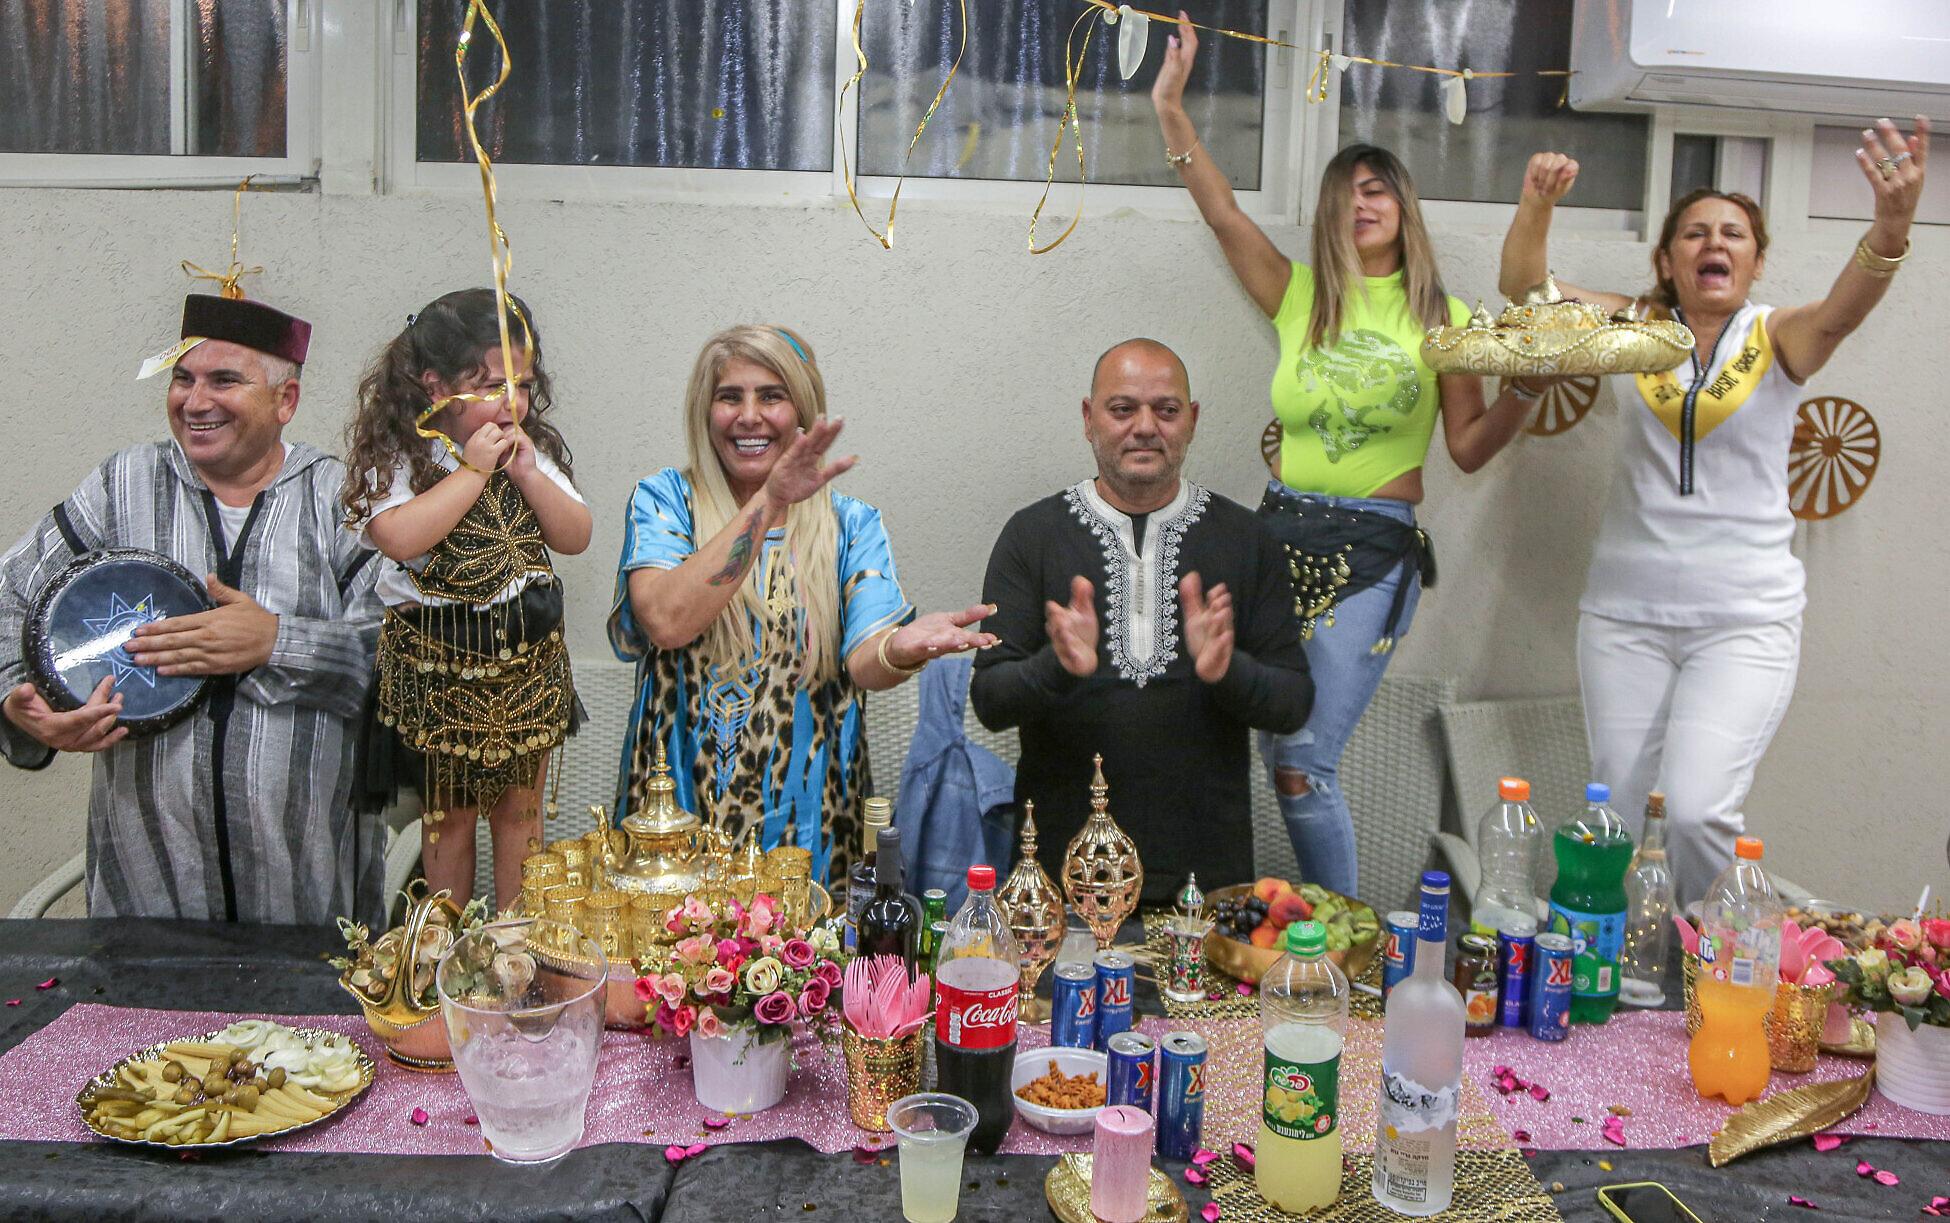 Les Marocains d'Israël fêtent la reprise des relations